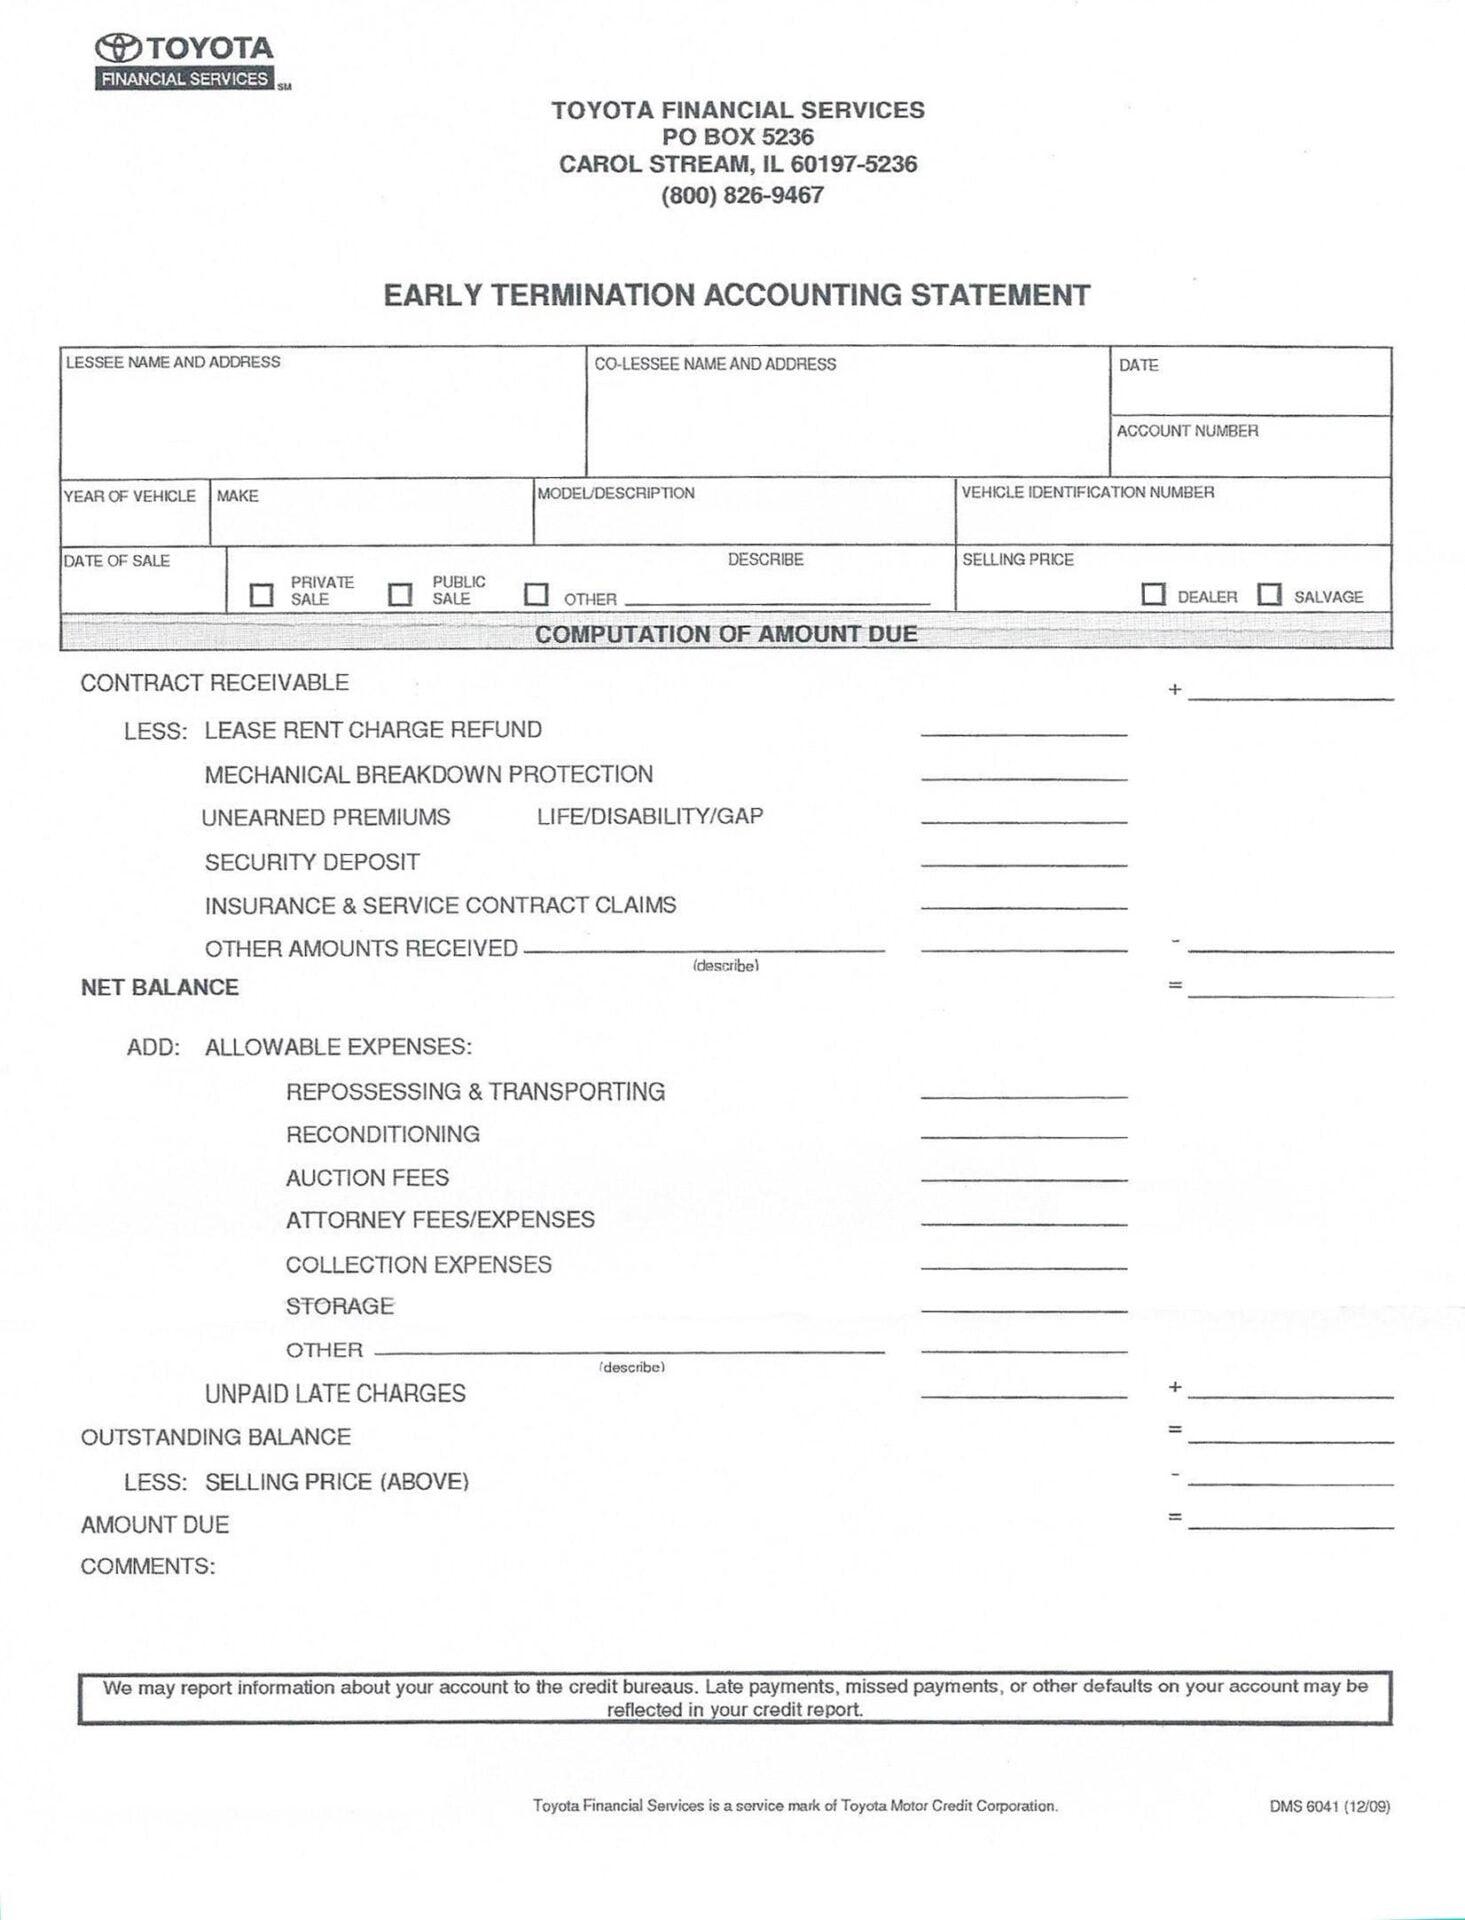 Sample Post-Repossession Account Statement).